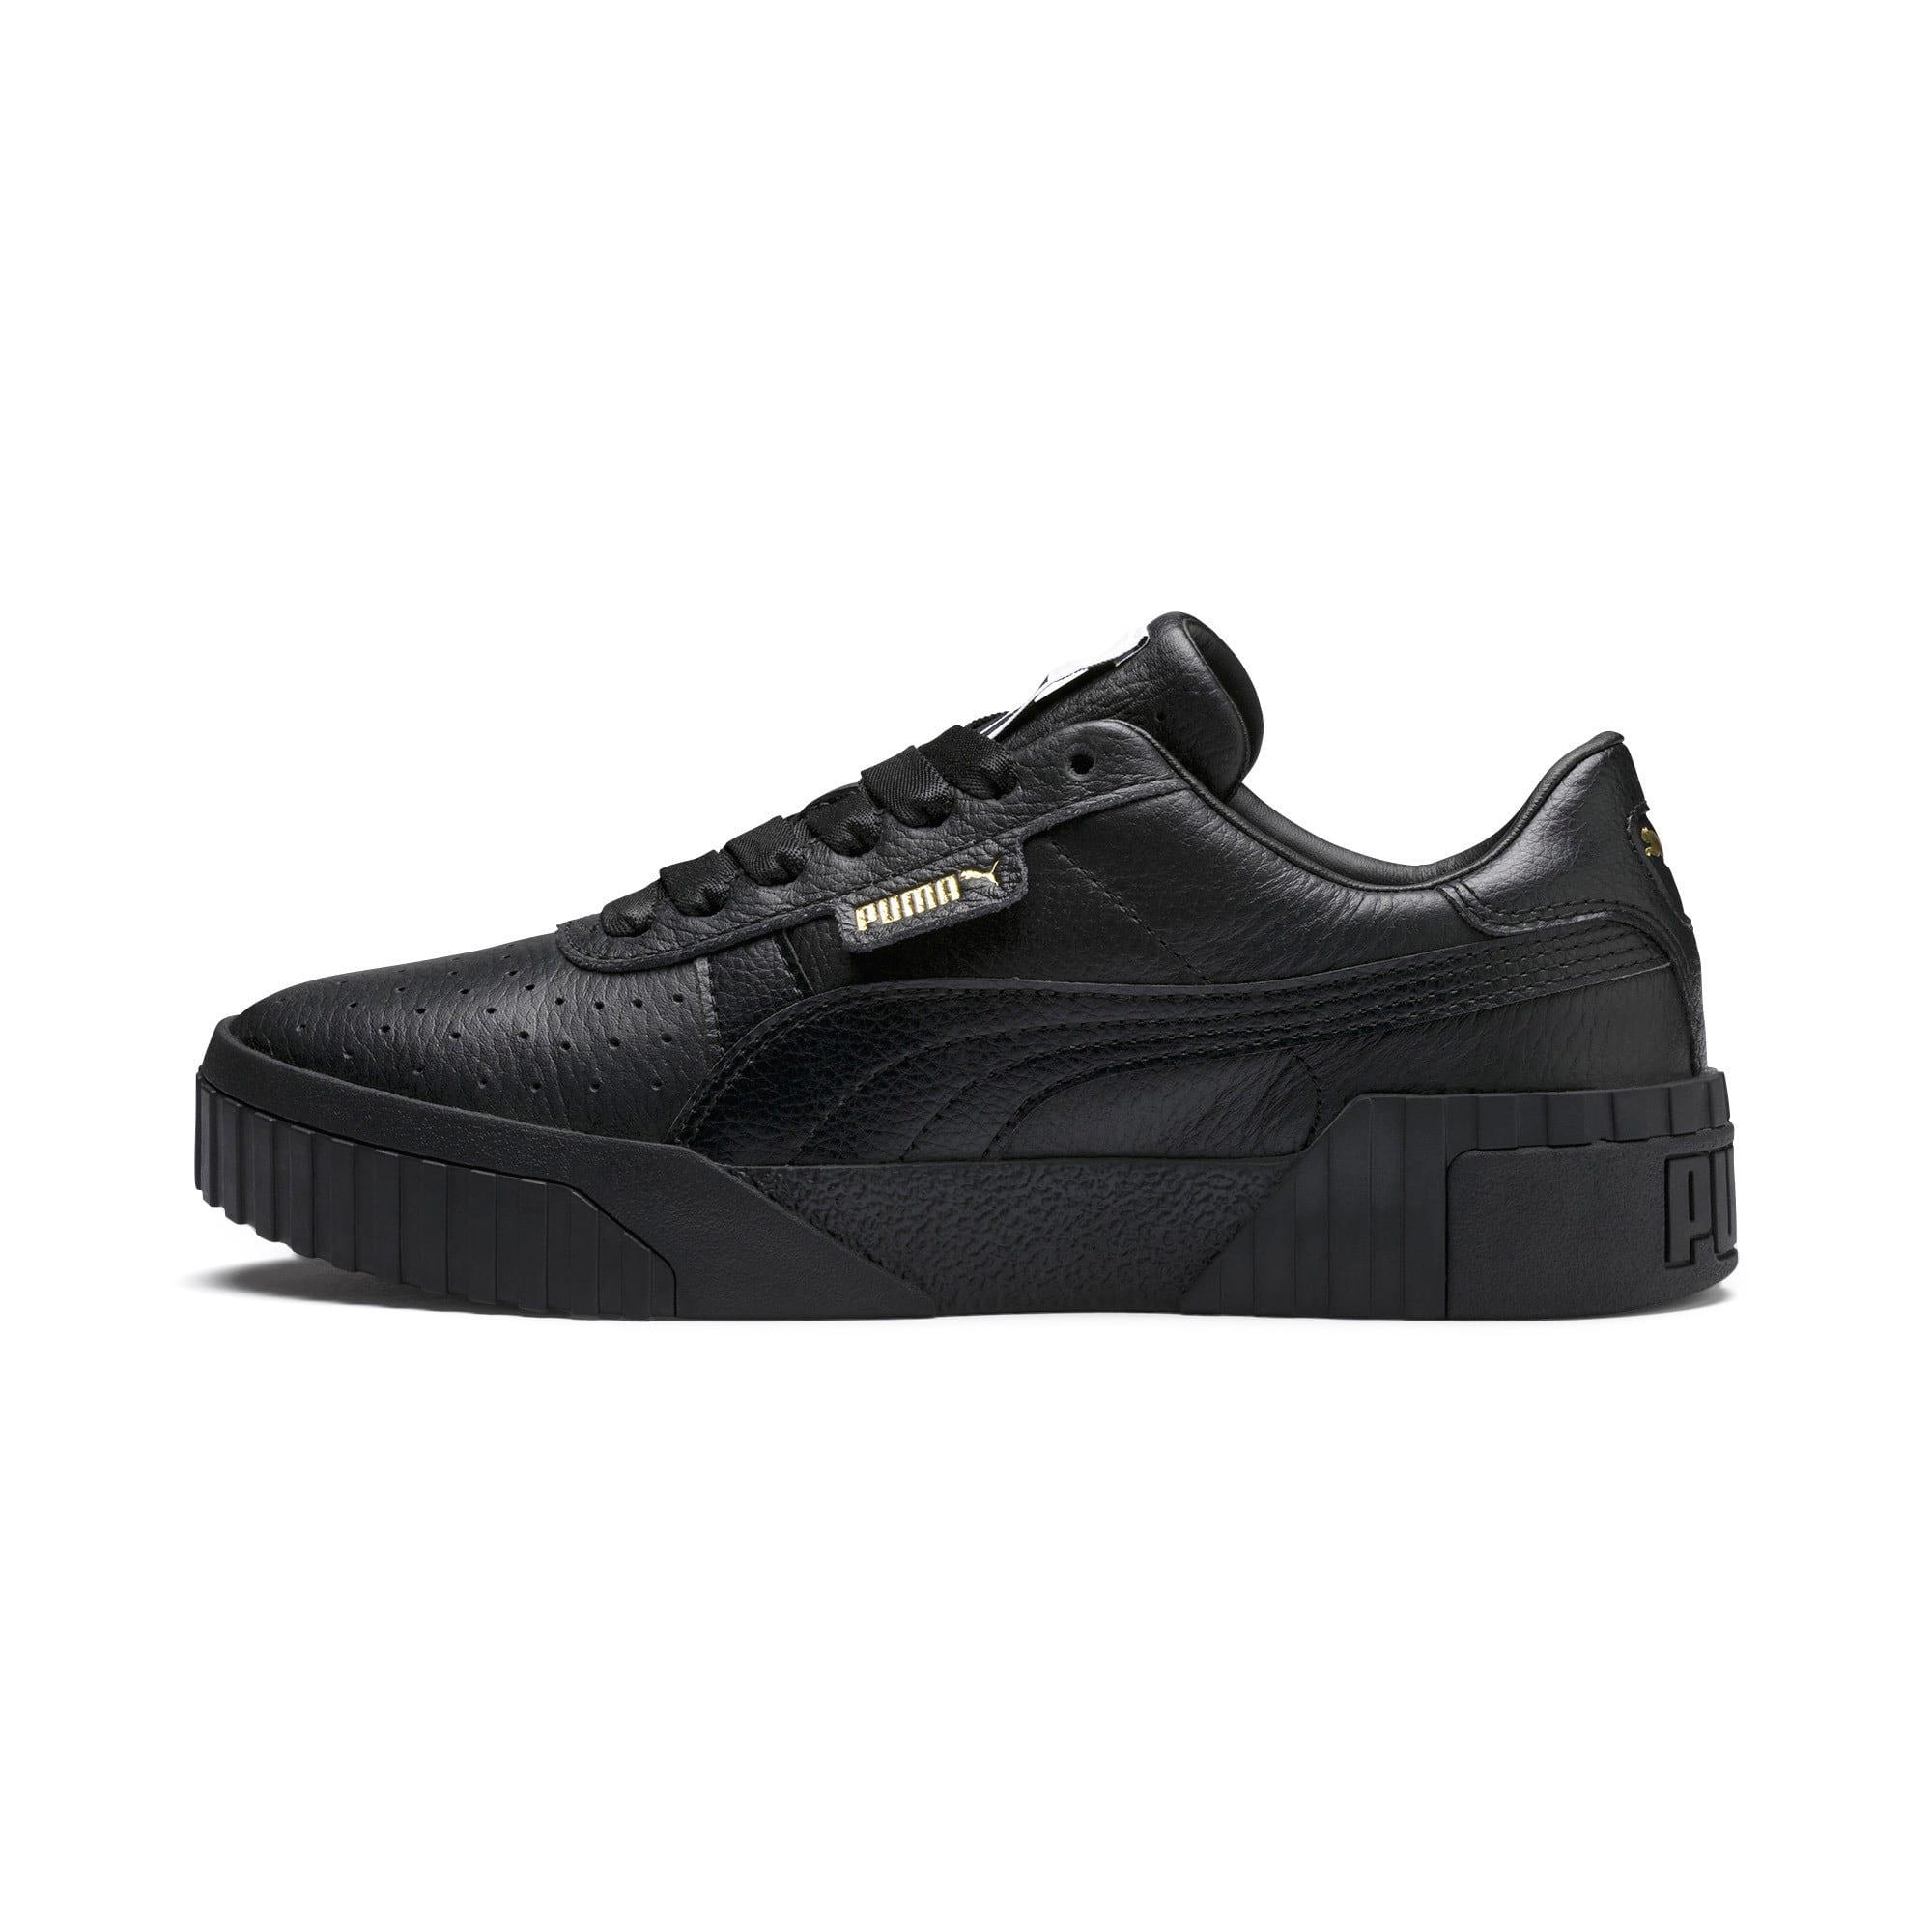 Thumbnail 1 of Sneakers Cali donna, Puma Black-Puma Black, medium